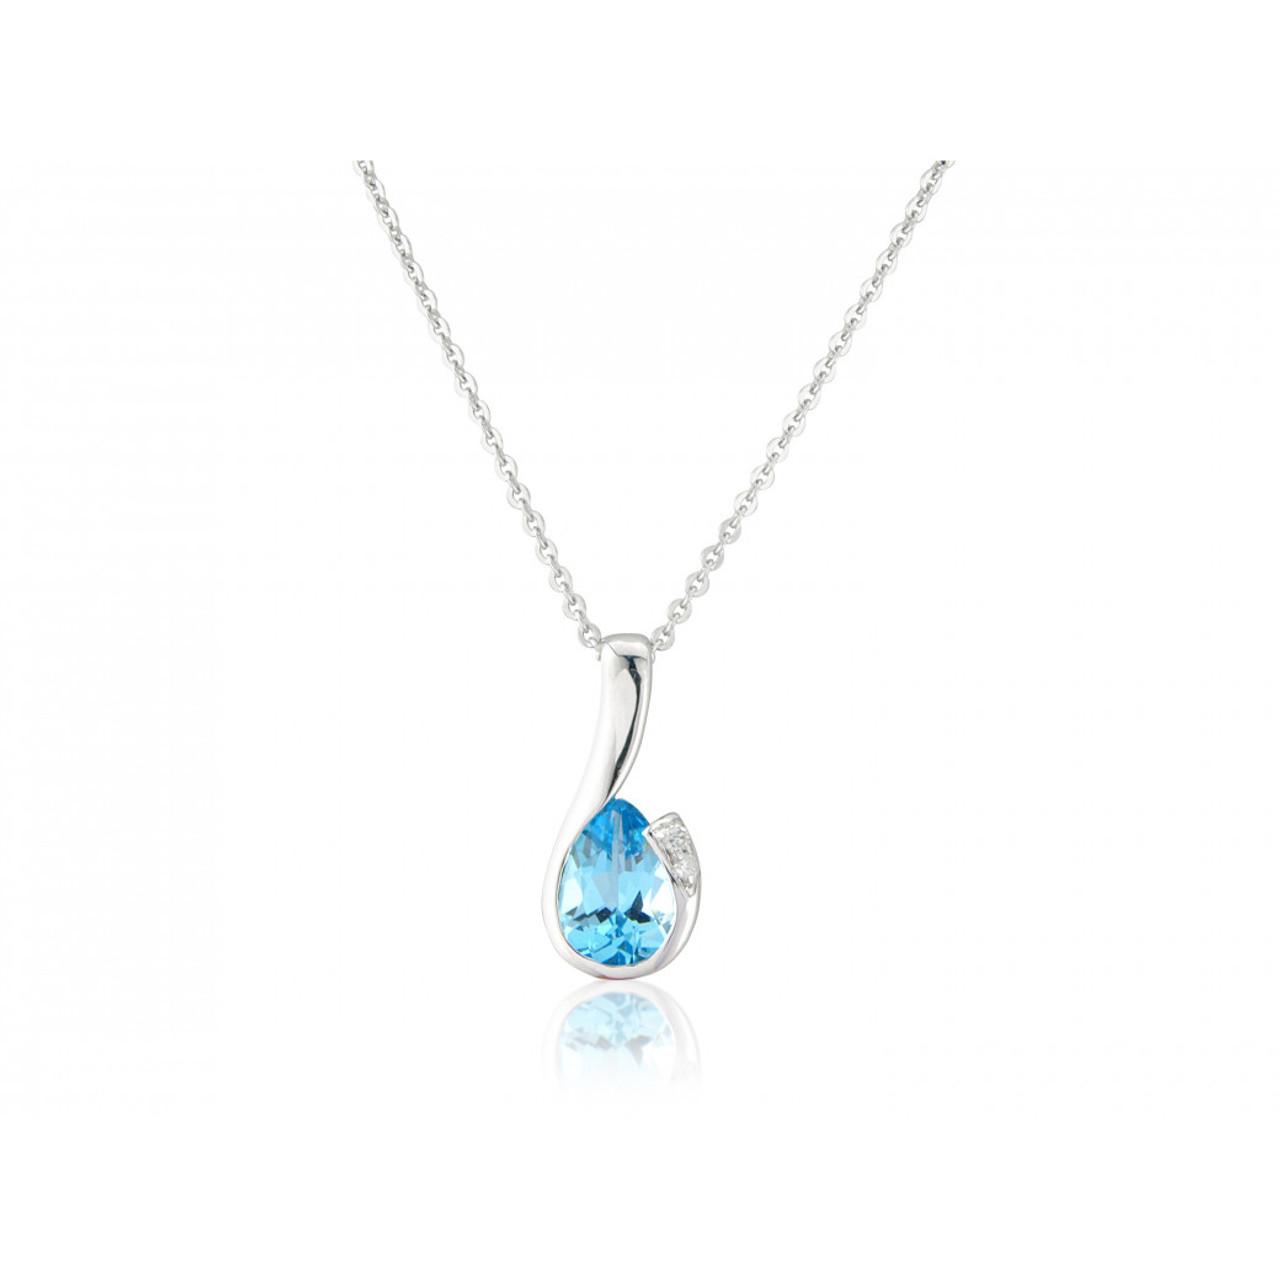 9ct White Gold Blue Topaz & Diamond Curl Pendant Necklace